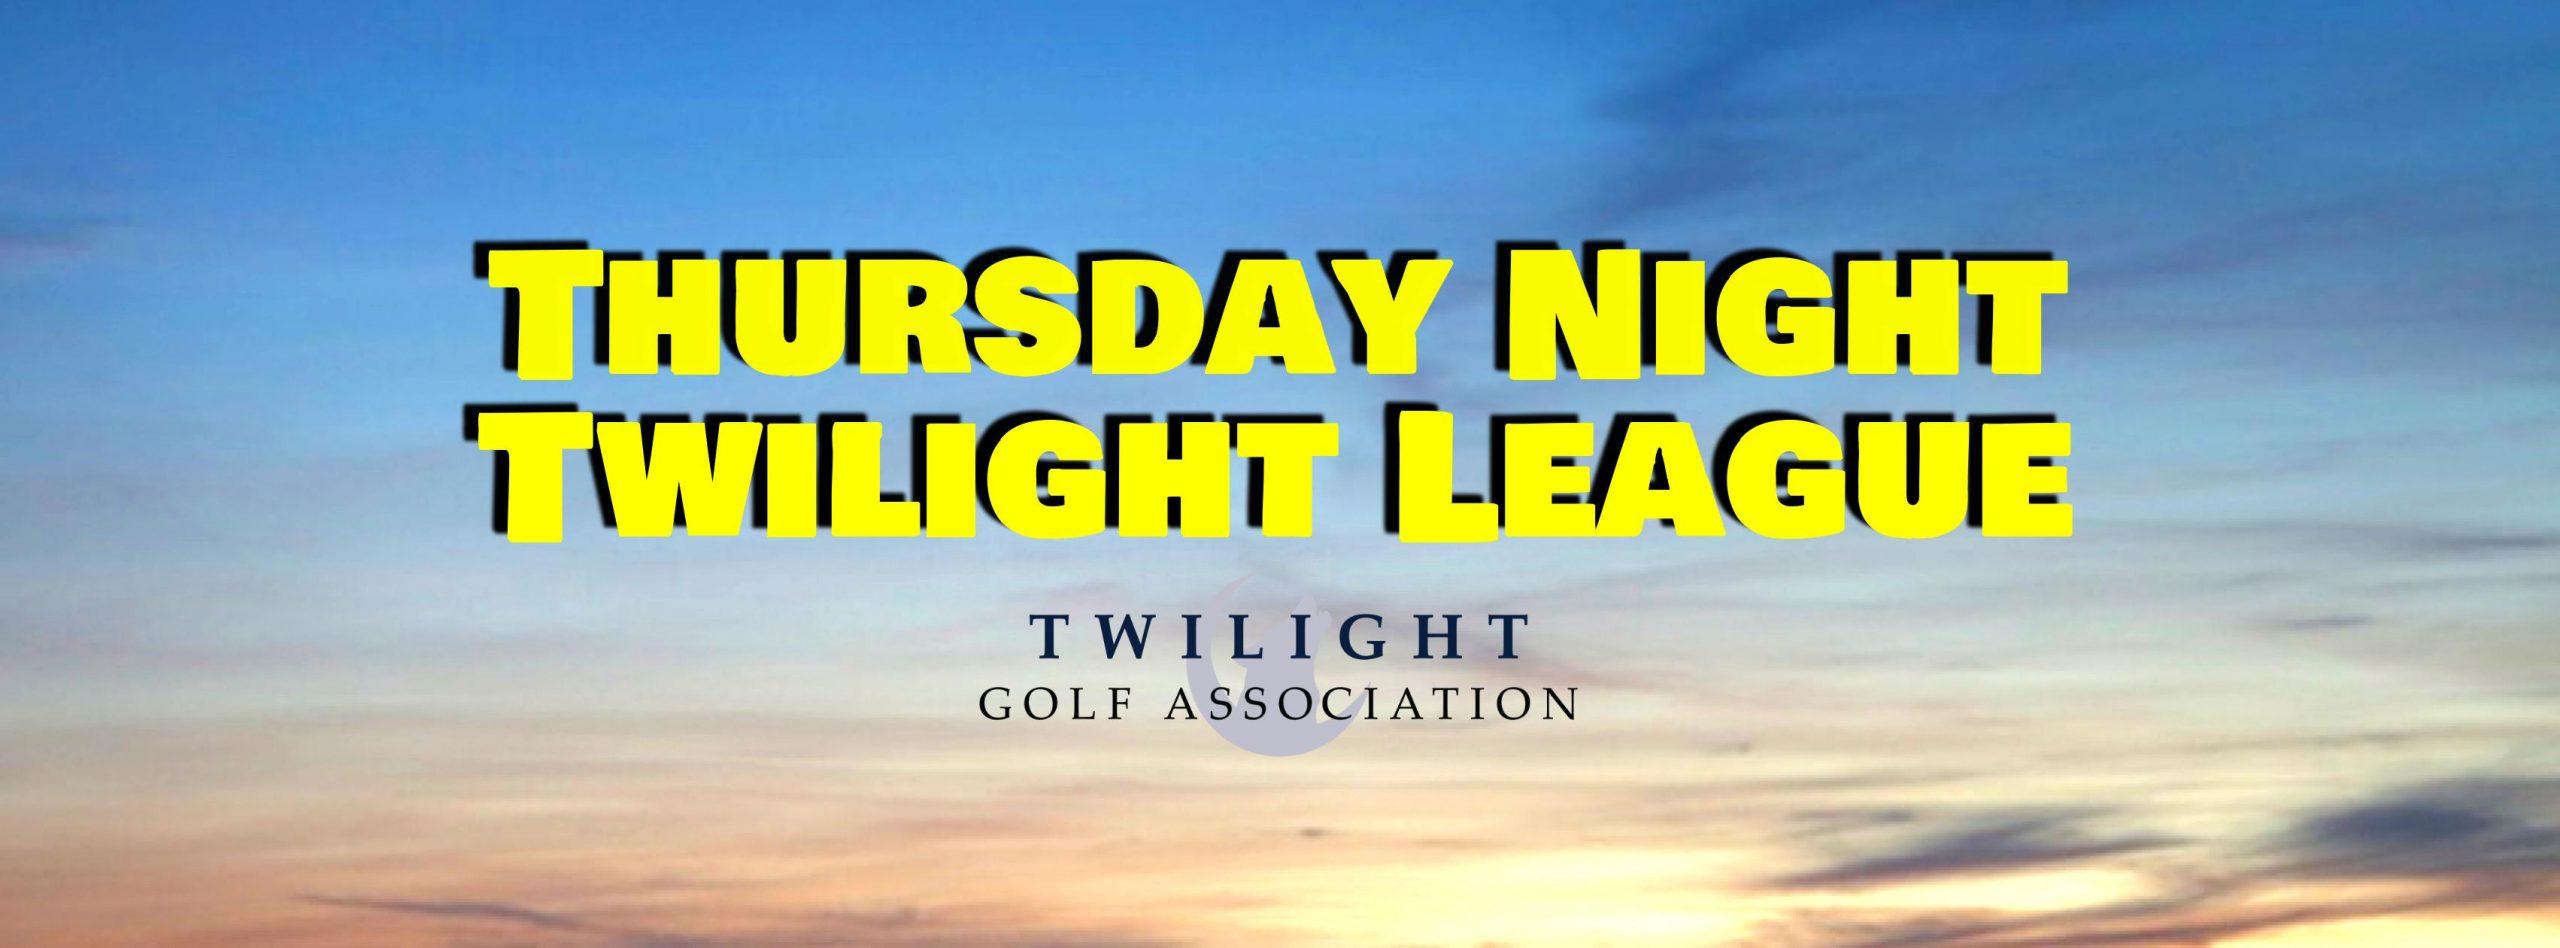 Thursday Night Twilight League at Stonebridge Golf Club